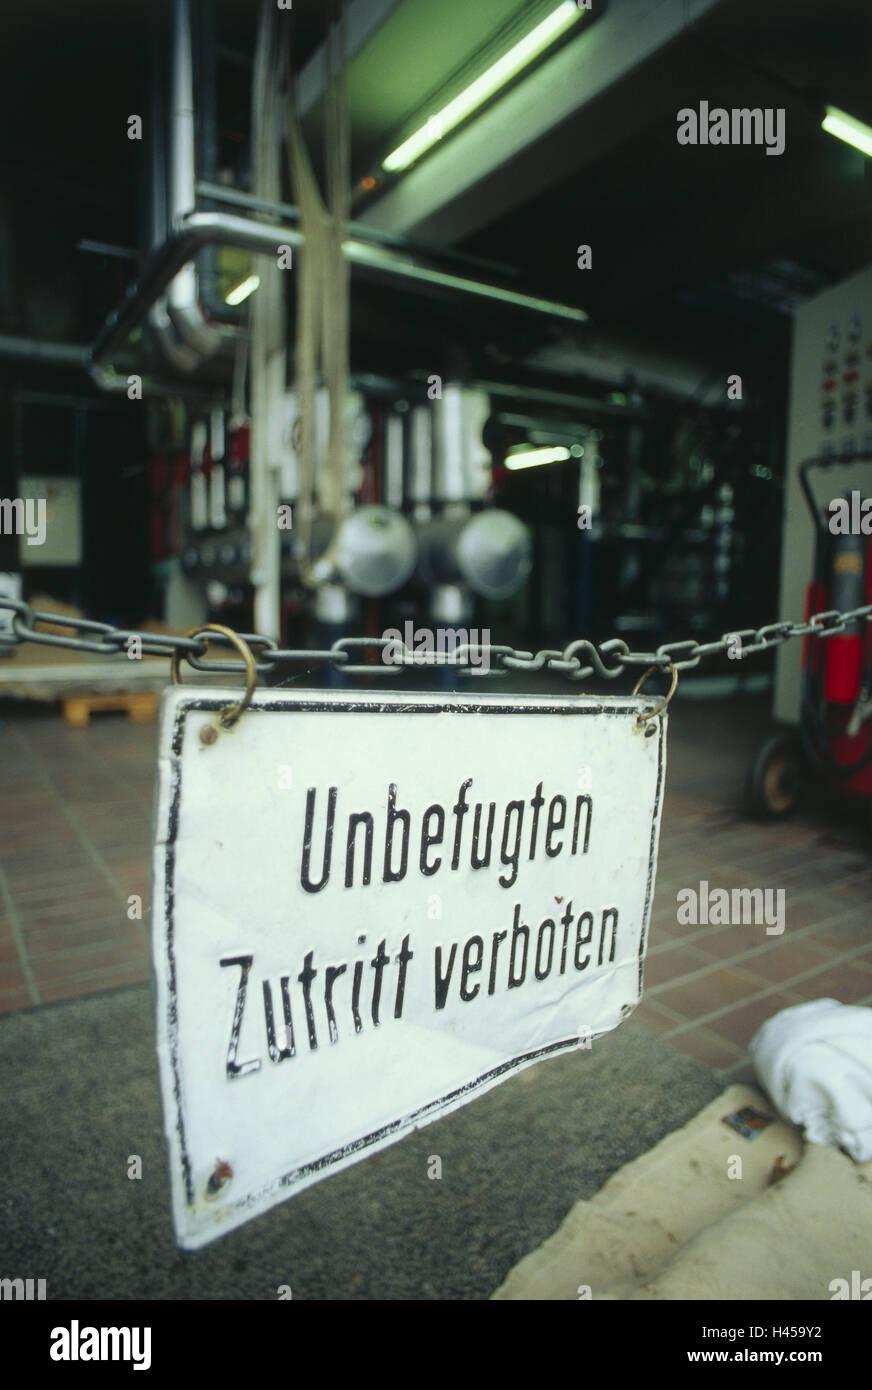 Machinery building, sign, no entry, blocking, catena, hall, machines, ban, input, tip, sign, warning, no parking - Stock Image